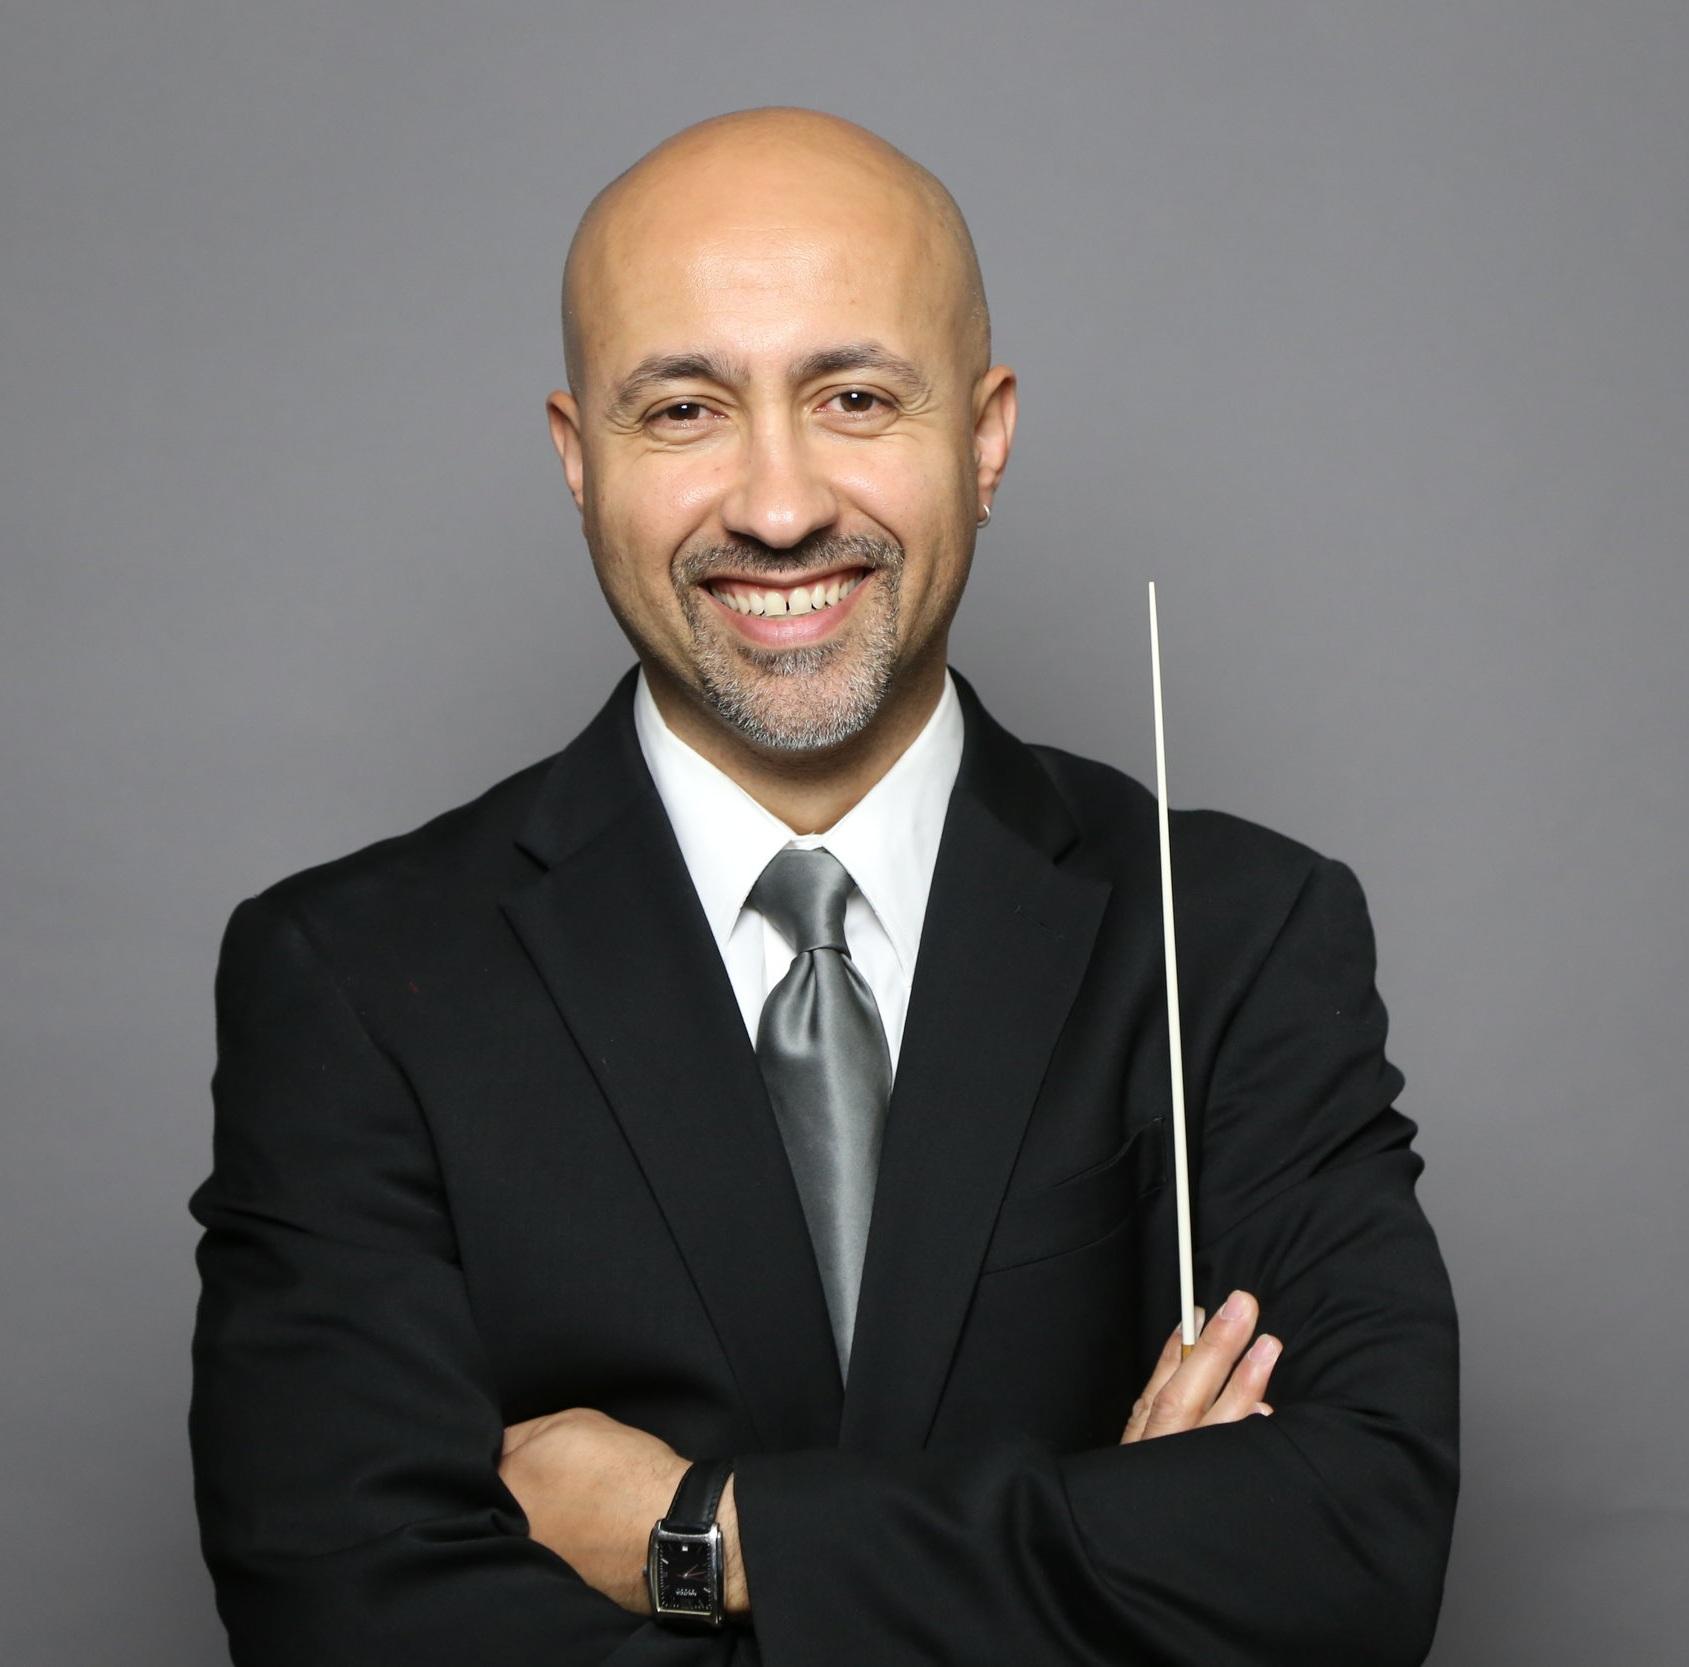 José Delgado - 合唱团董事作詞